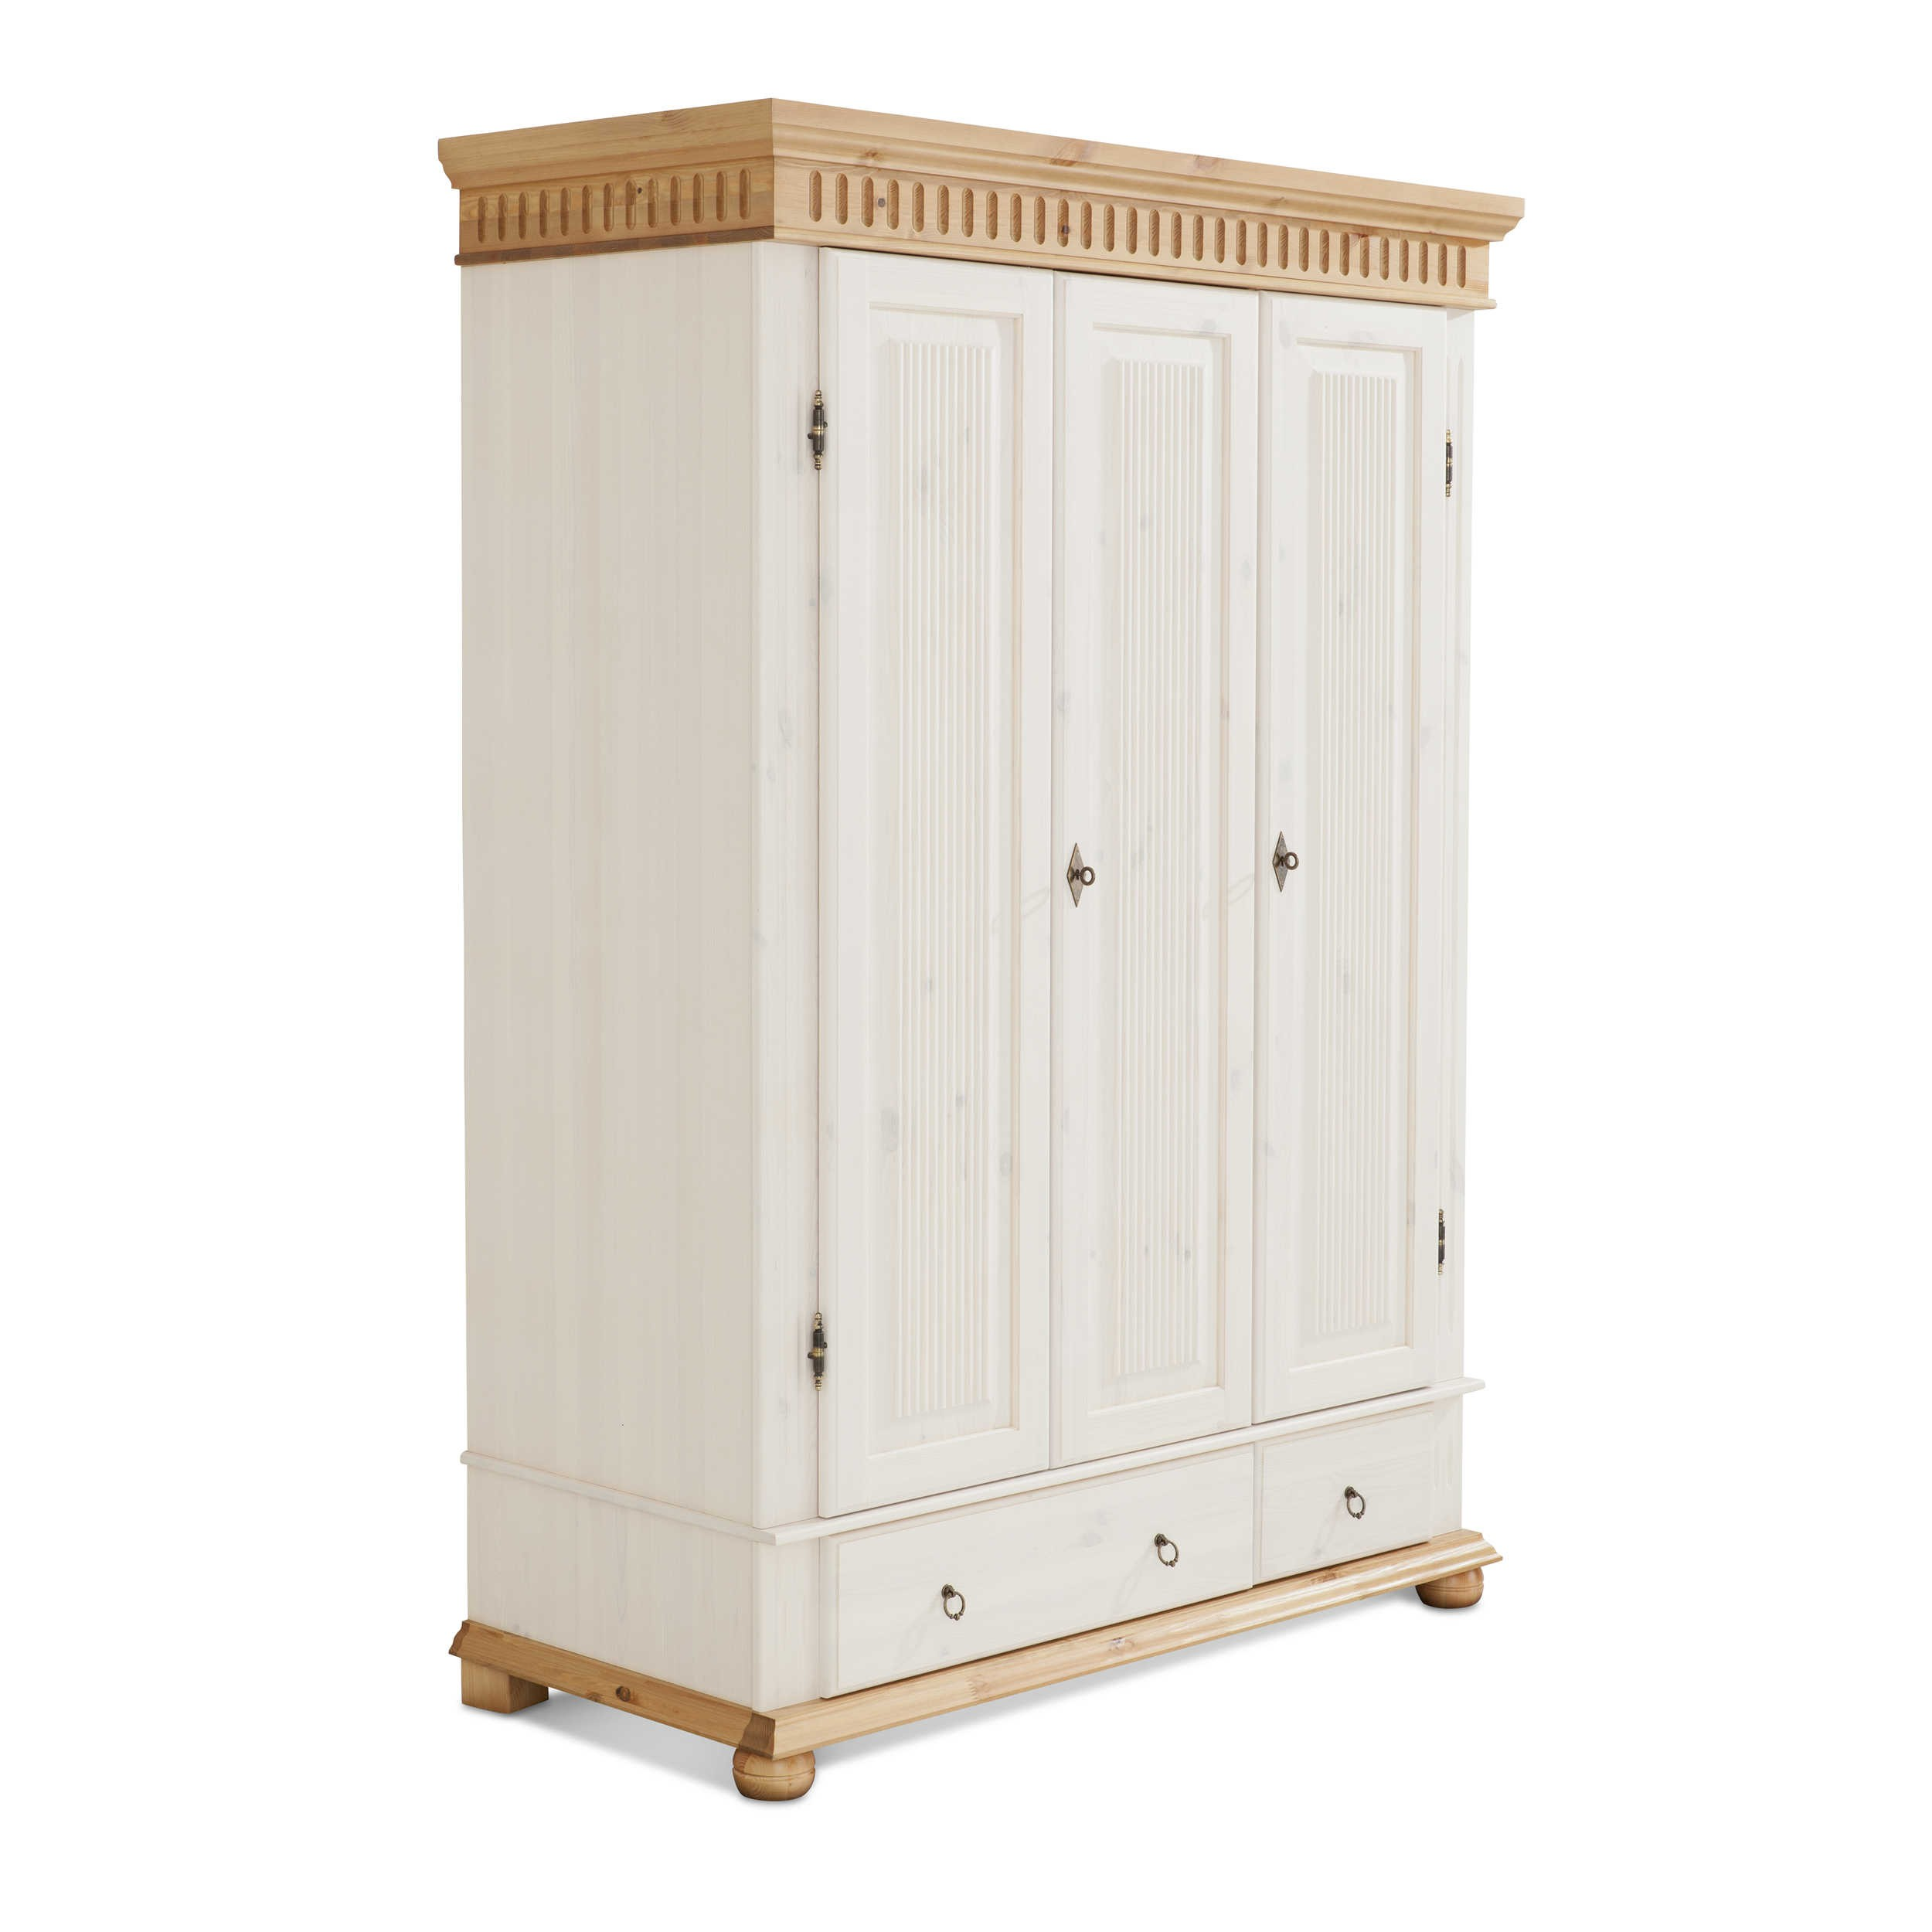 kleiderschrank aviano 140 x 199 cm. Black Bedroom Furniture Sets. Home Design Ideas